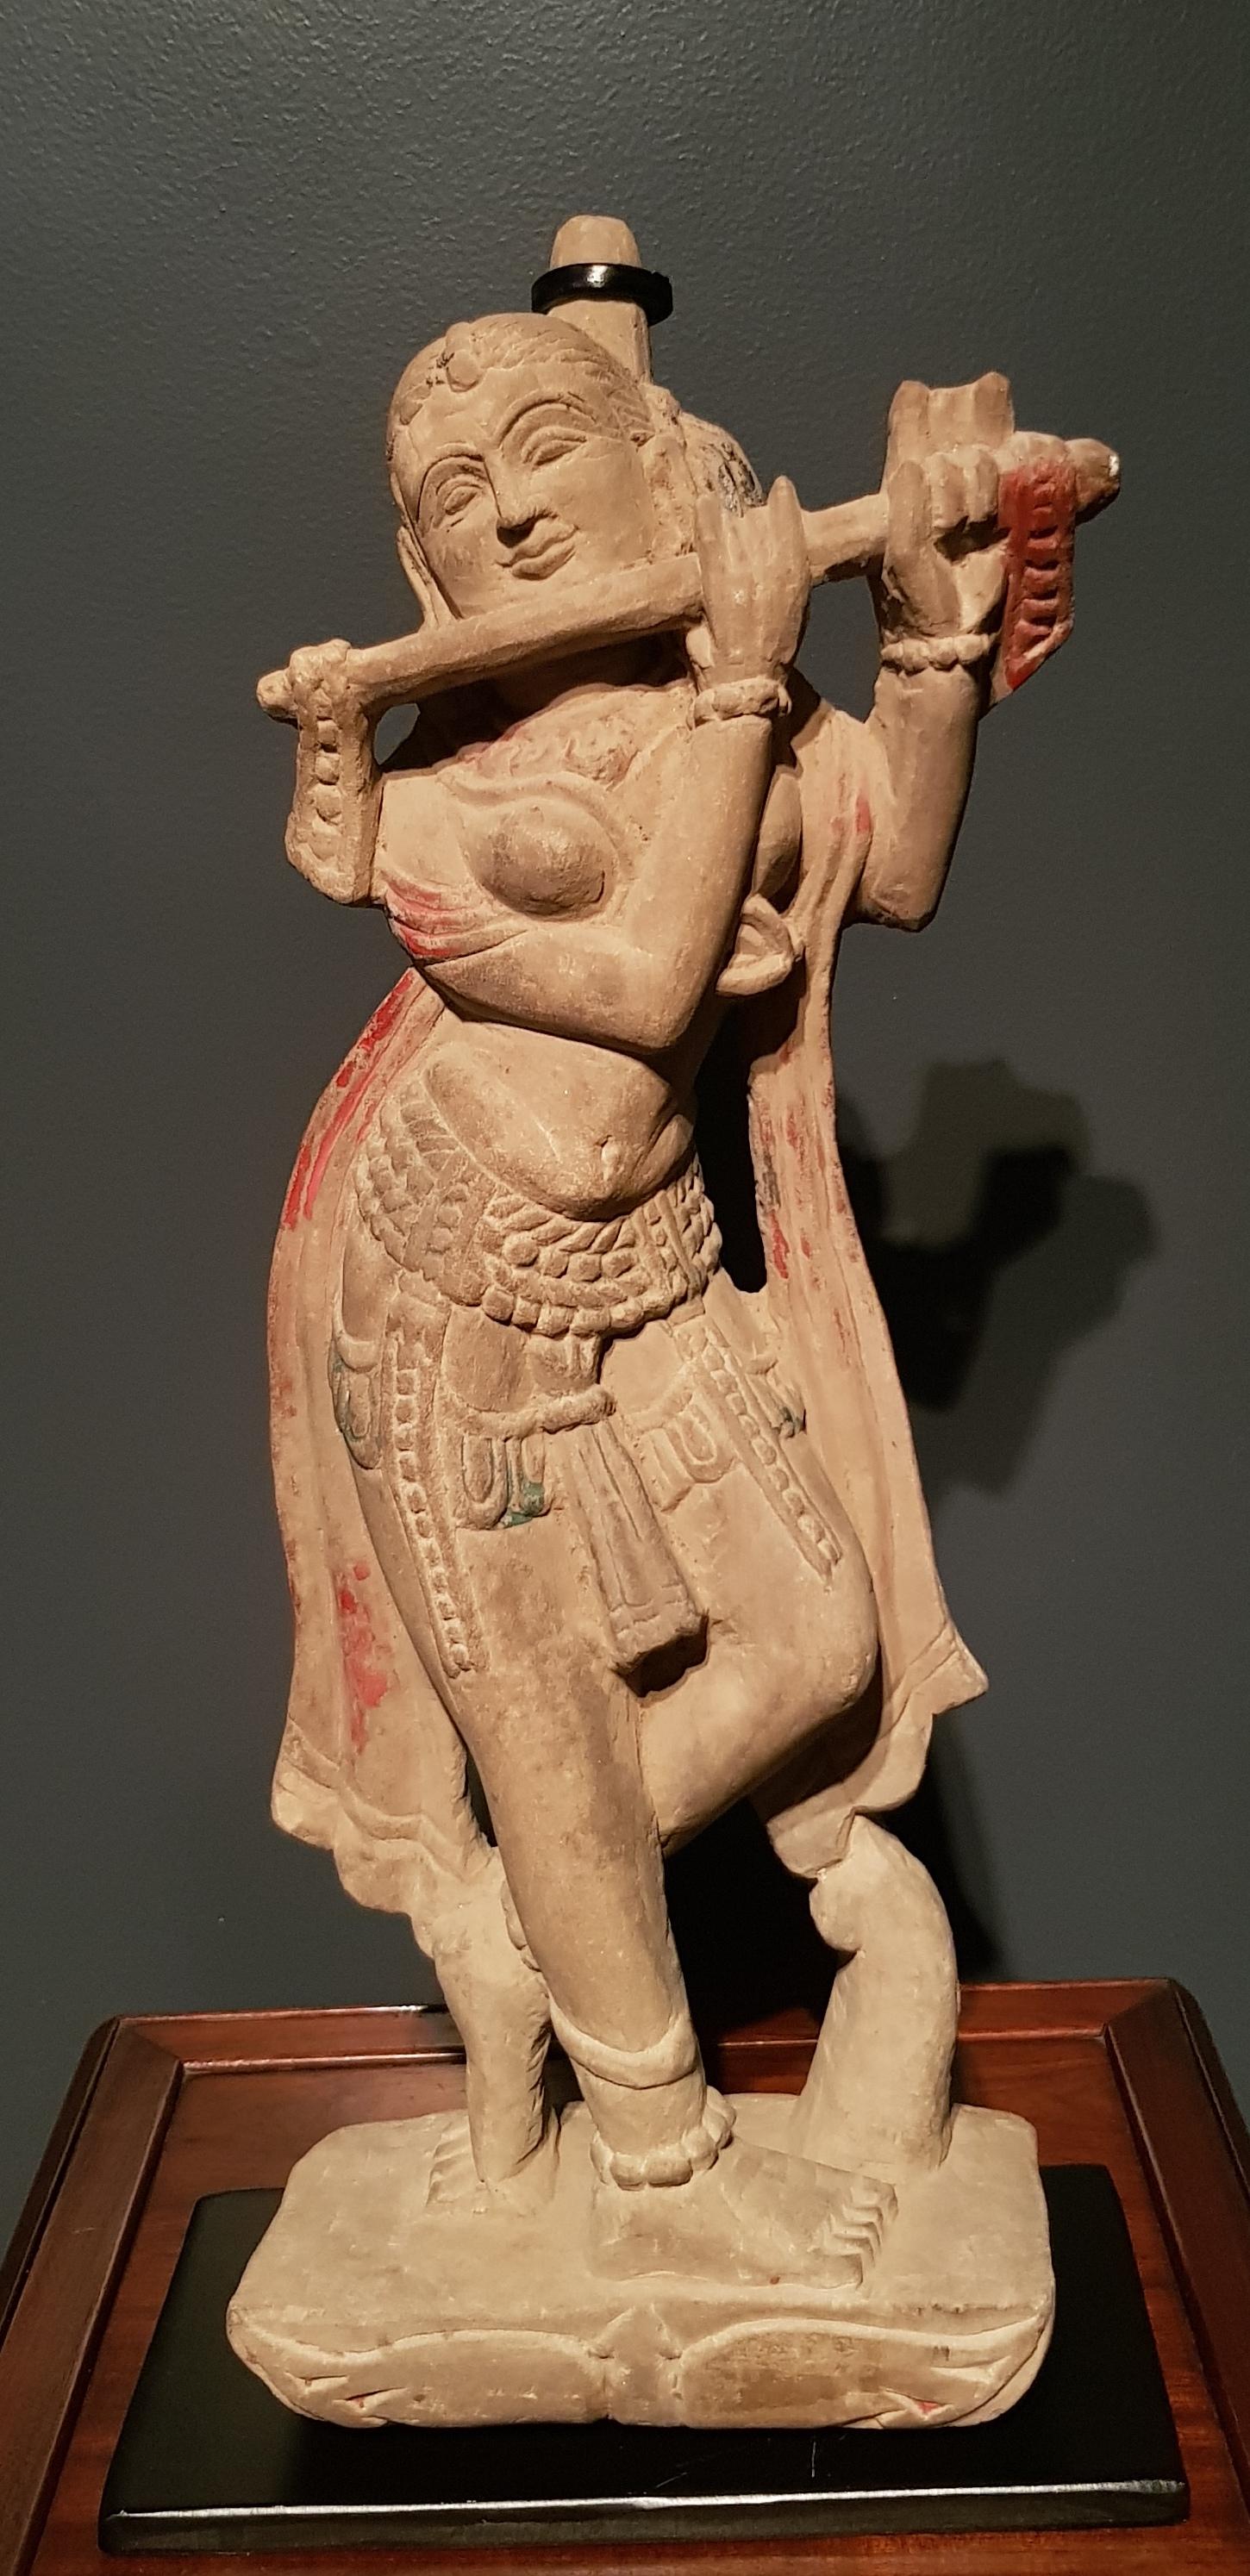 Inde - Devangana en pierre - Madhya Pradesh - 17ème. Image